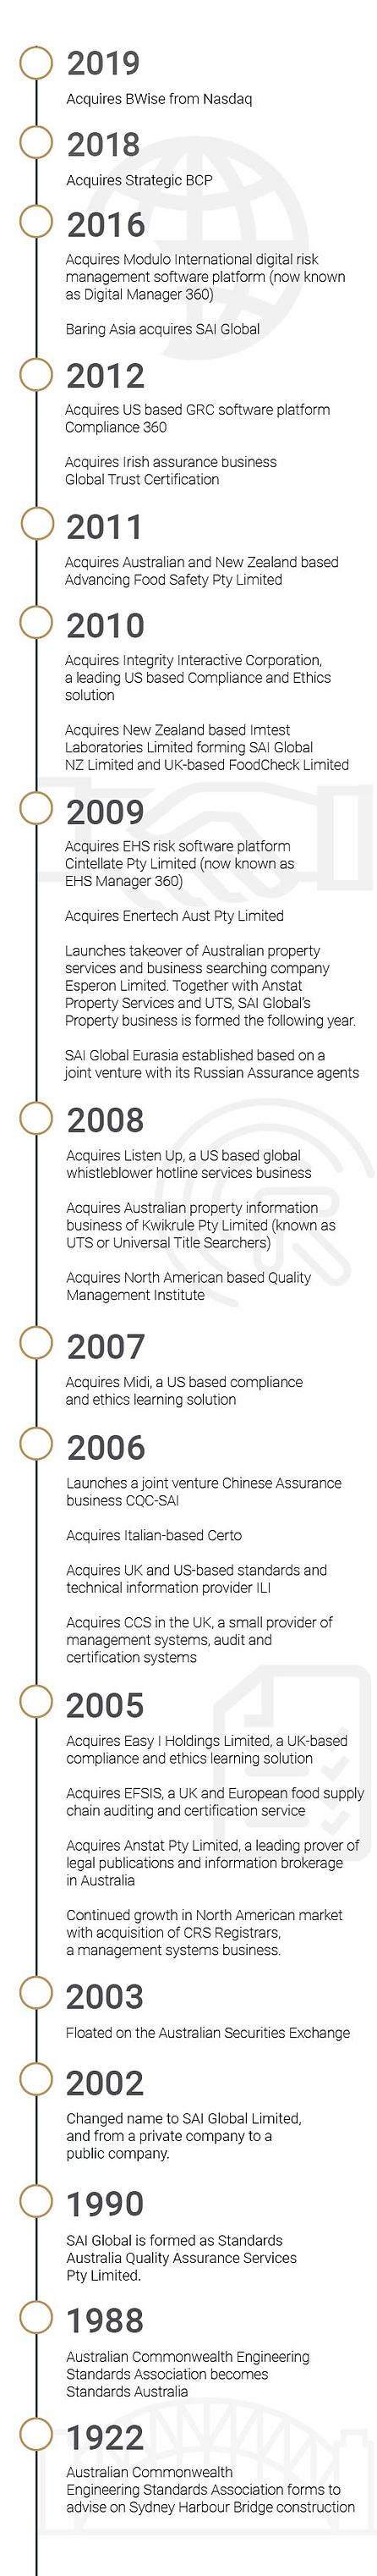 Timeline Graphic - SAI Global